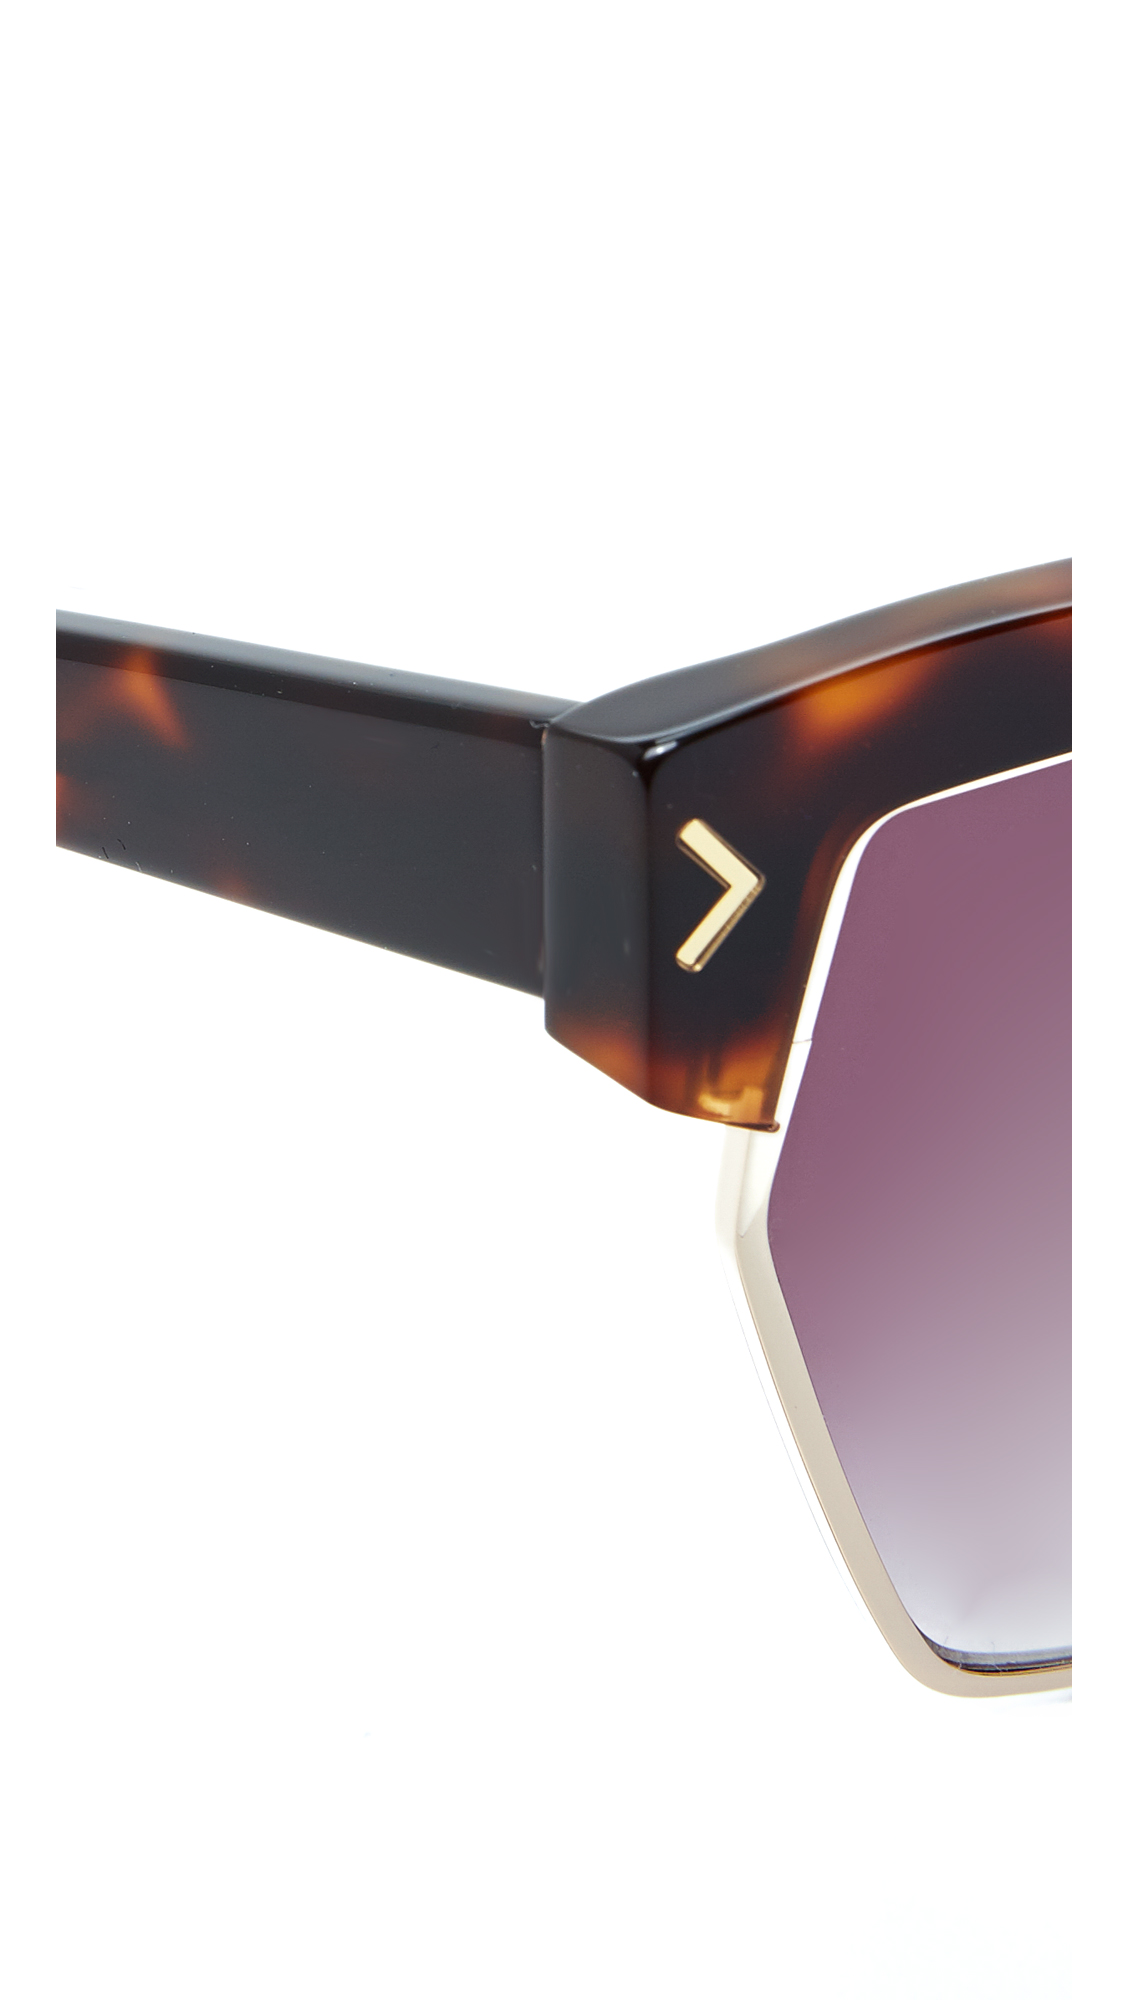 bb5f31e3b48 KENDALL + KYLIE Melrose Sunglasses